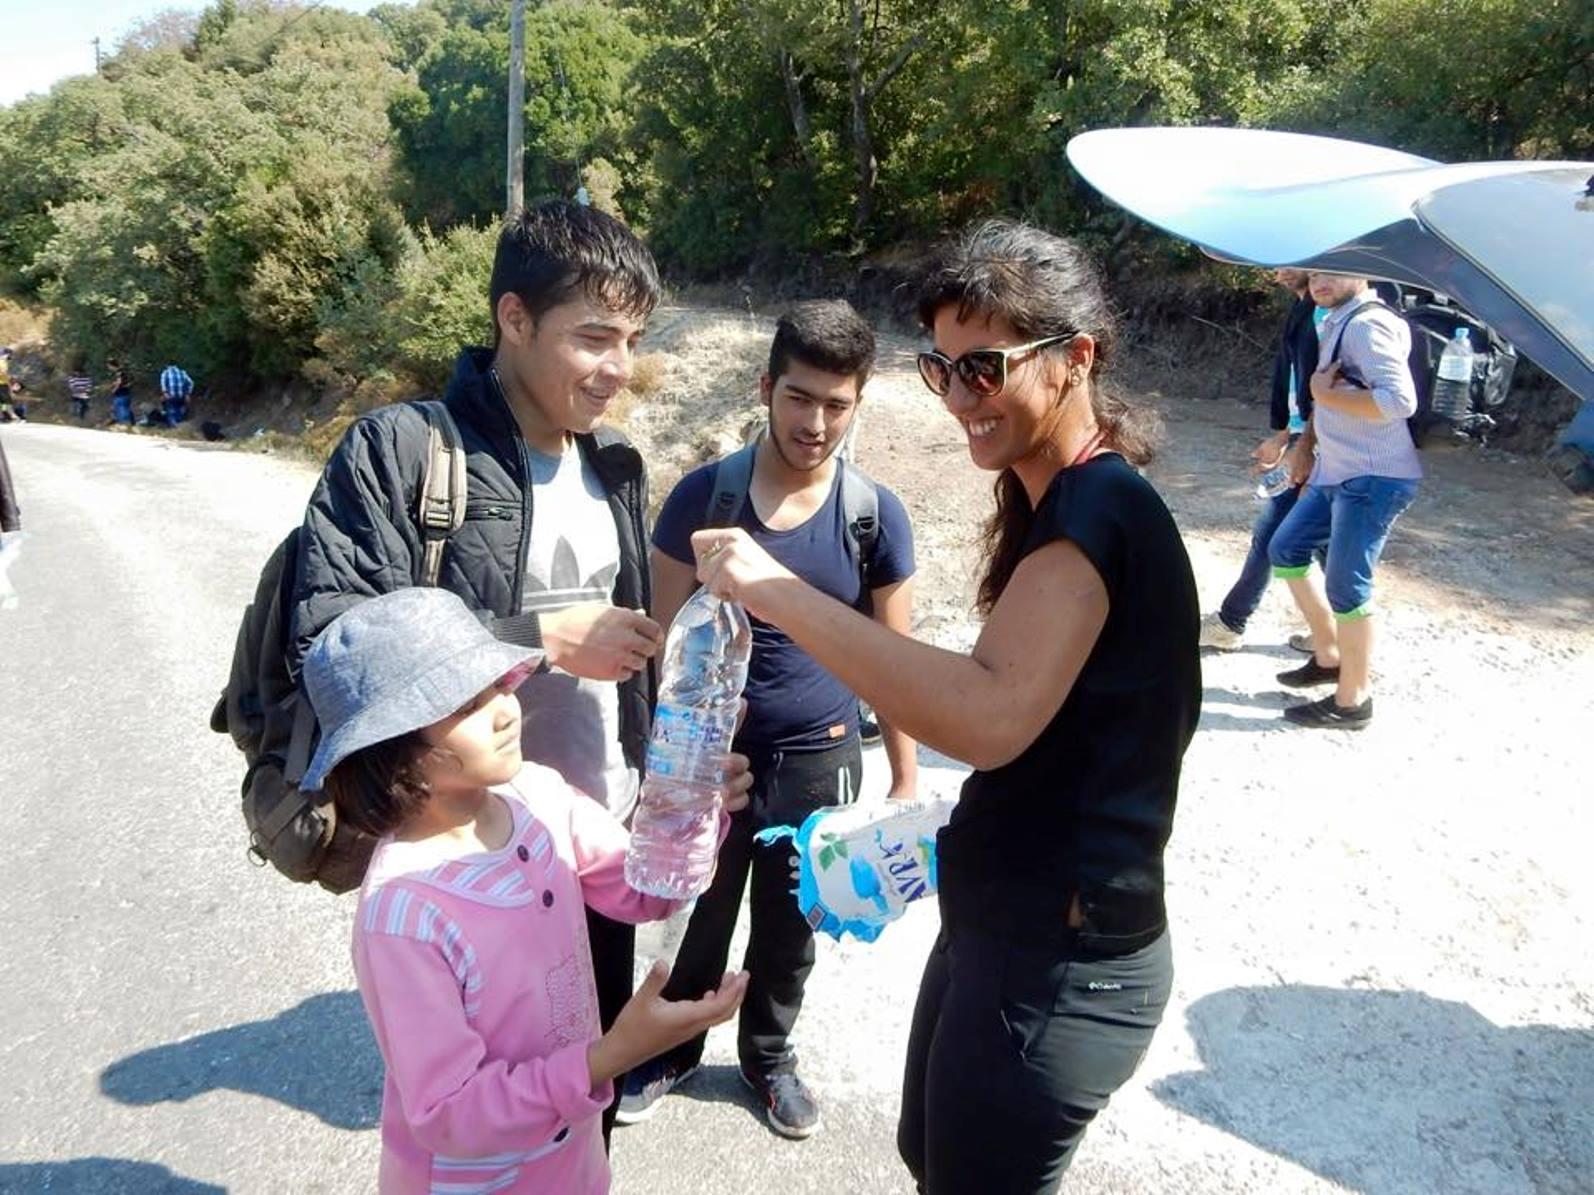 IsraAID volunteers distributed water and fruit in a refugee camp. Photo via Facebook